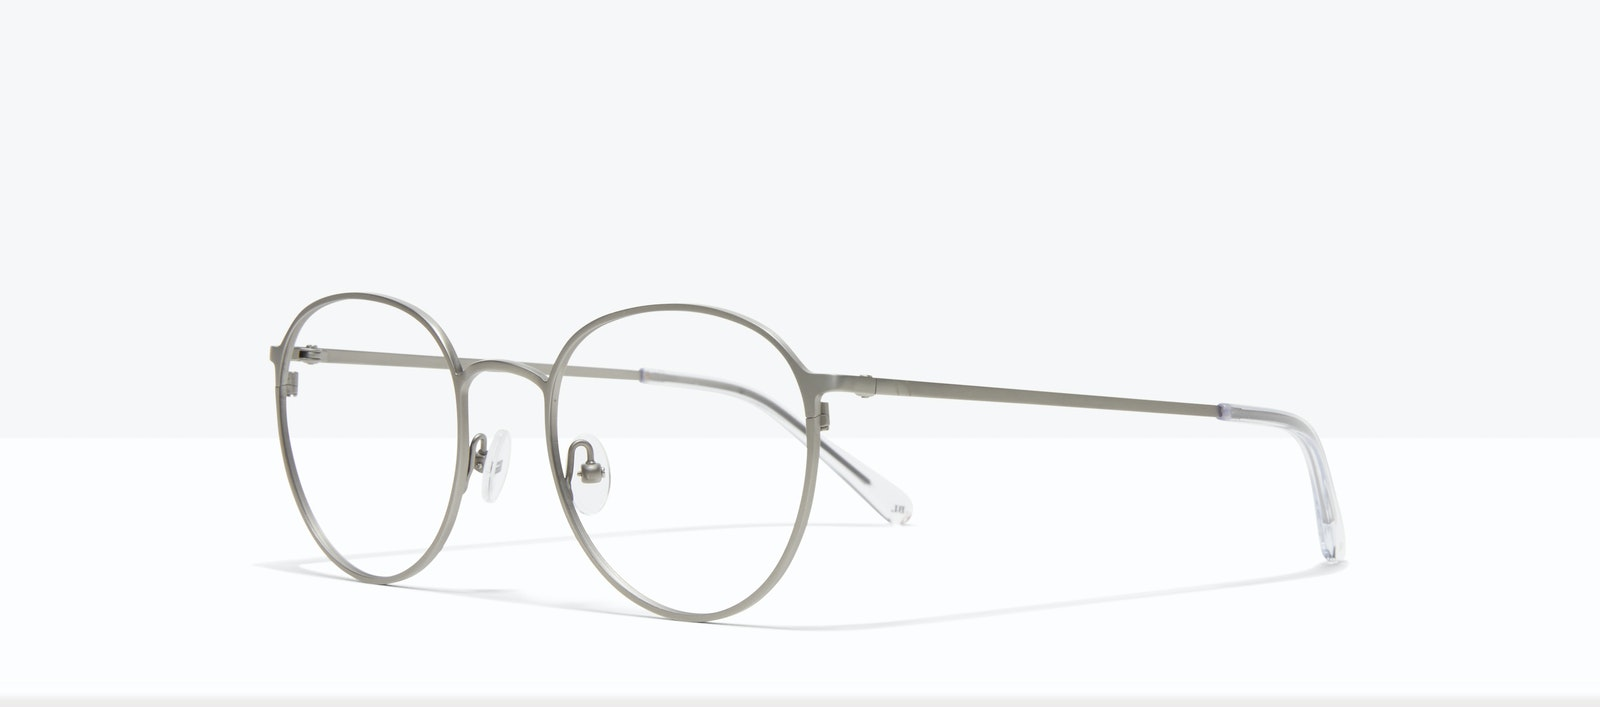 Affordable Fashion Glasses Round Eyeglasses Men Ridge Silver Tilt